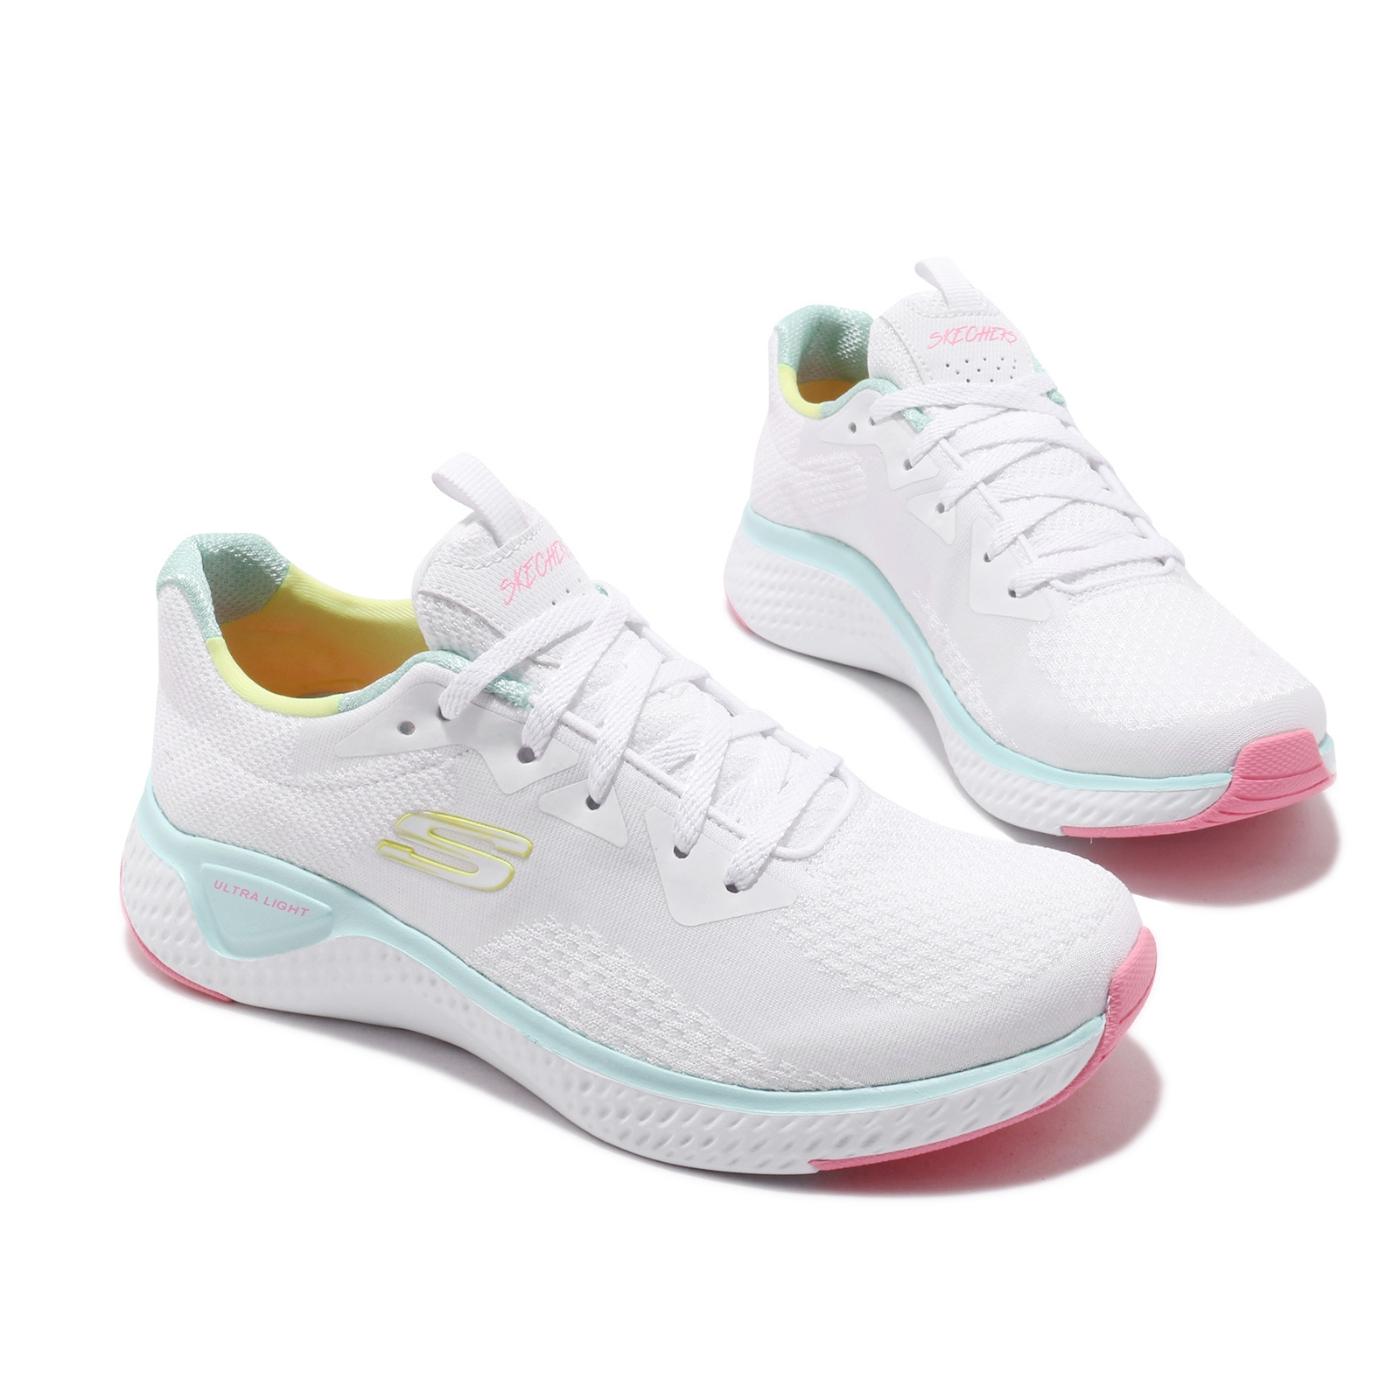 Skechers 慢跑鞋 Solar Fuse 運動休閒 女鞋 輕量 避震 粉嫩色系 球鞋穿搭 白 黃 粉 13328WMLT